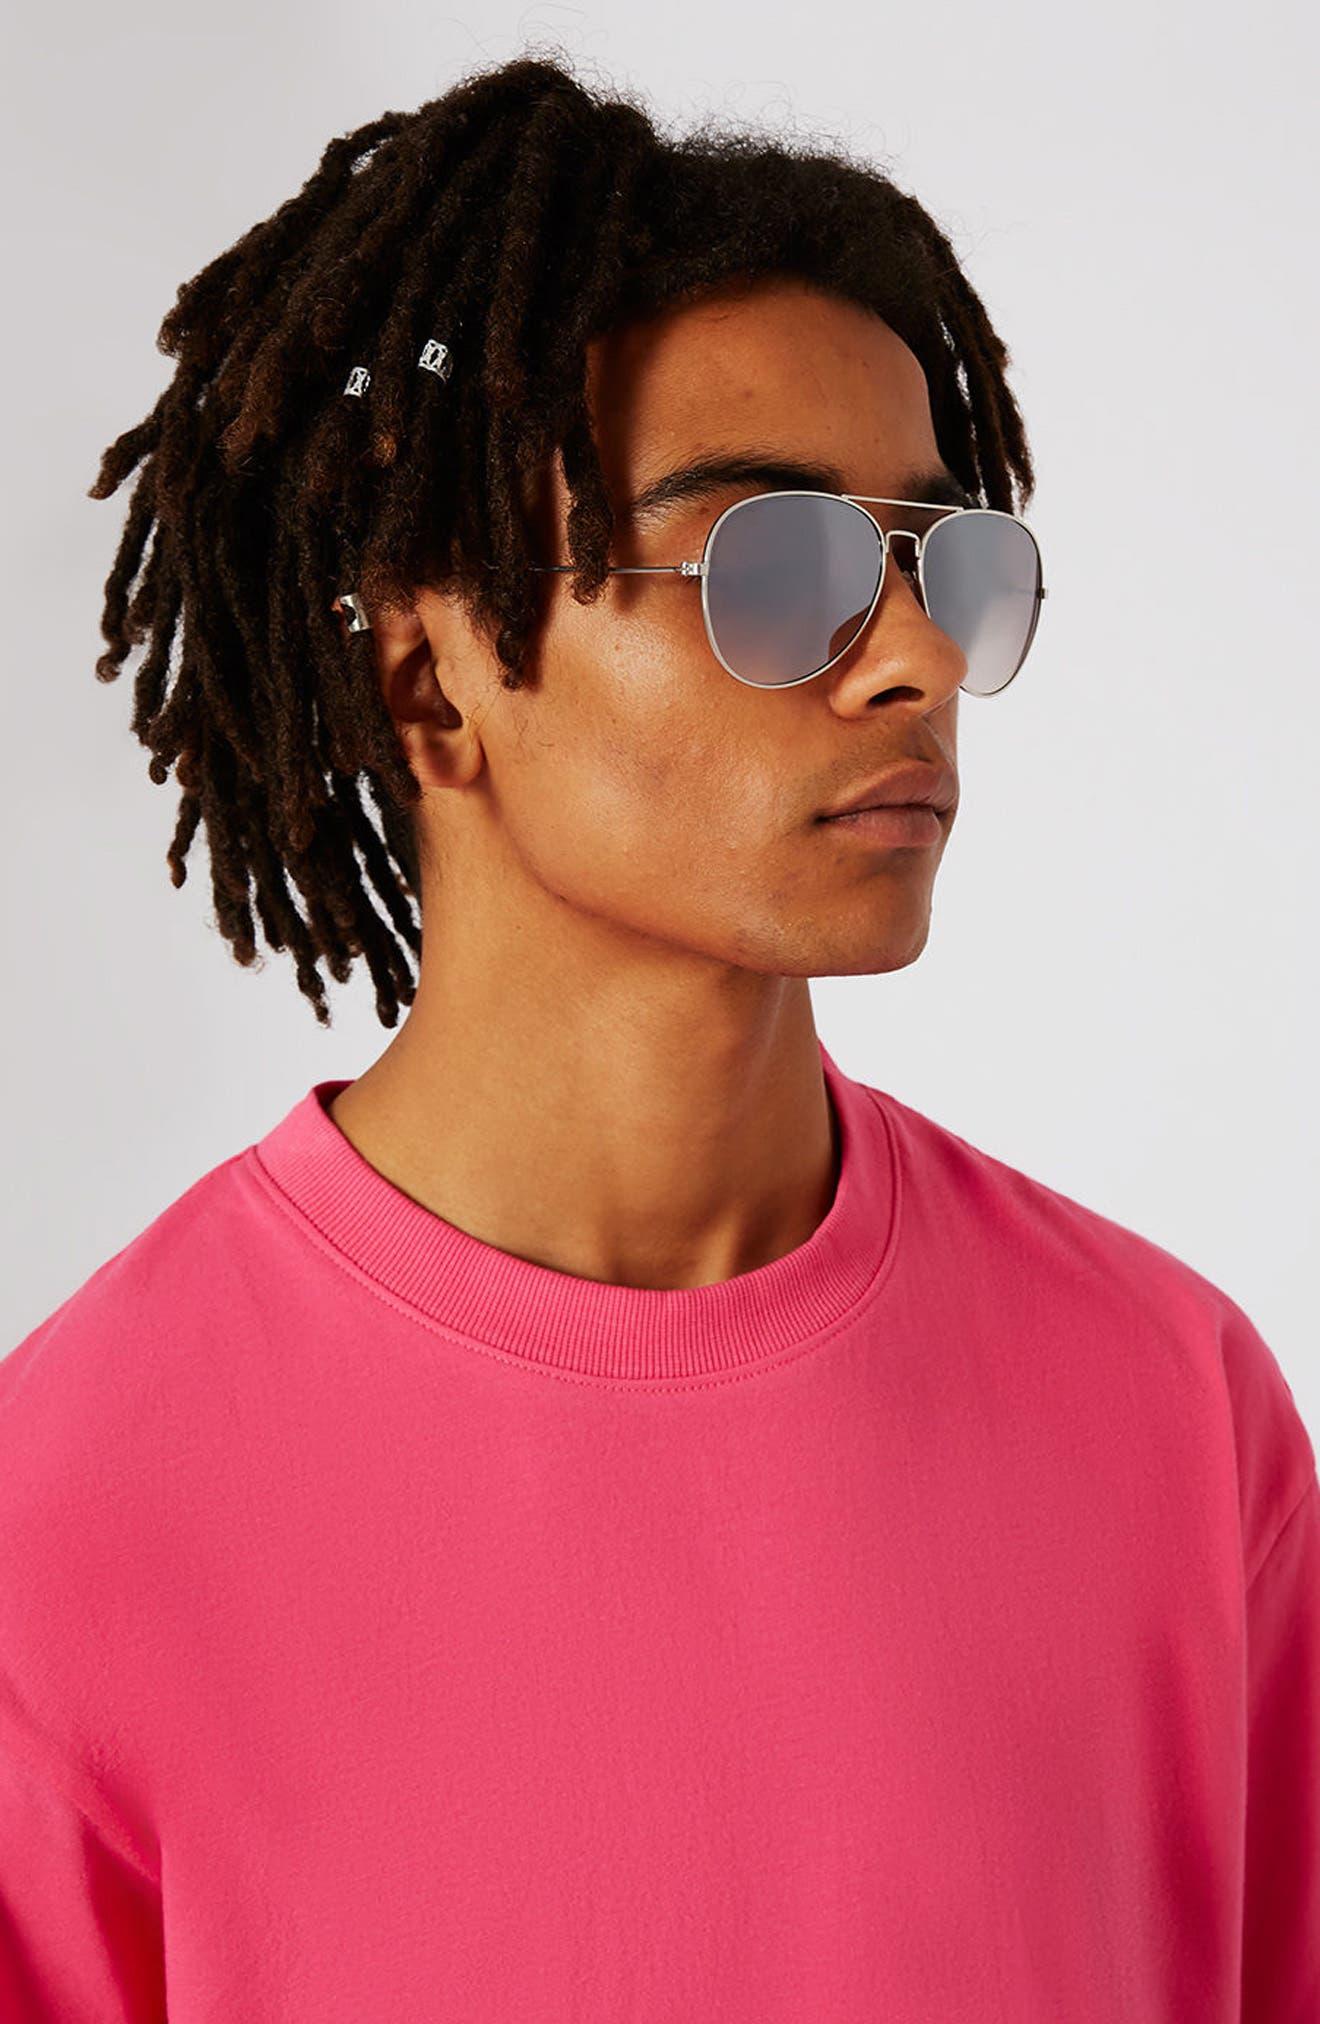 58mm Mirrored Aviator Sunglasses,                             Alternate thumbnail 3, color,                             040